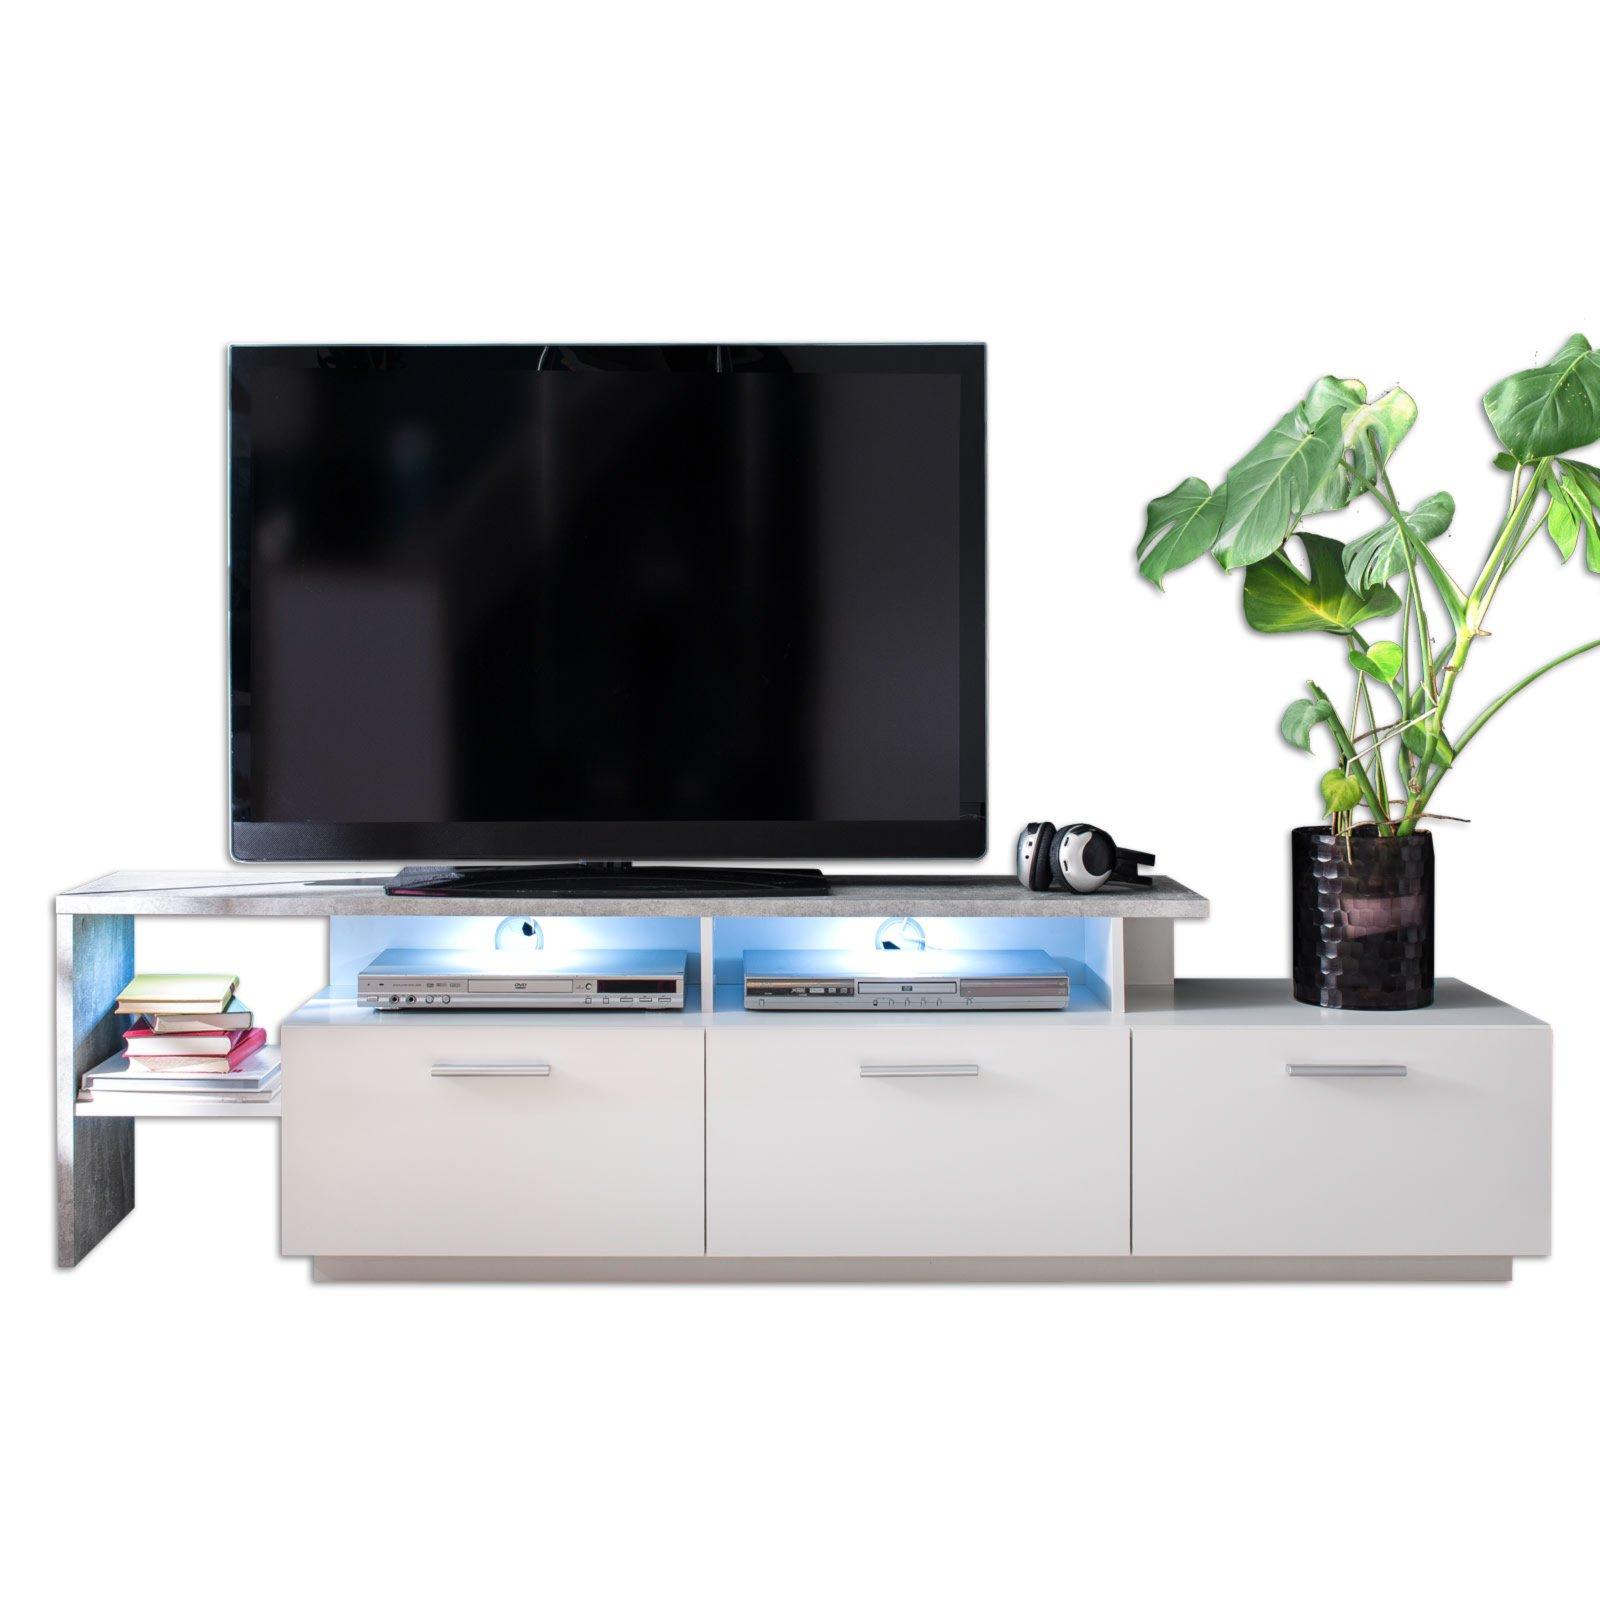 TV-Lowboard STREAM - weiß matt-Beton - 195 cm | Online bei ROLLER ...